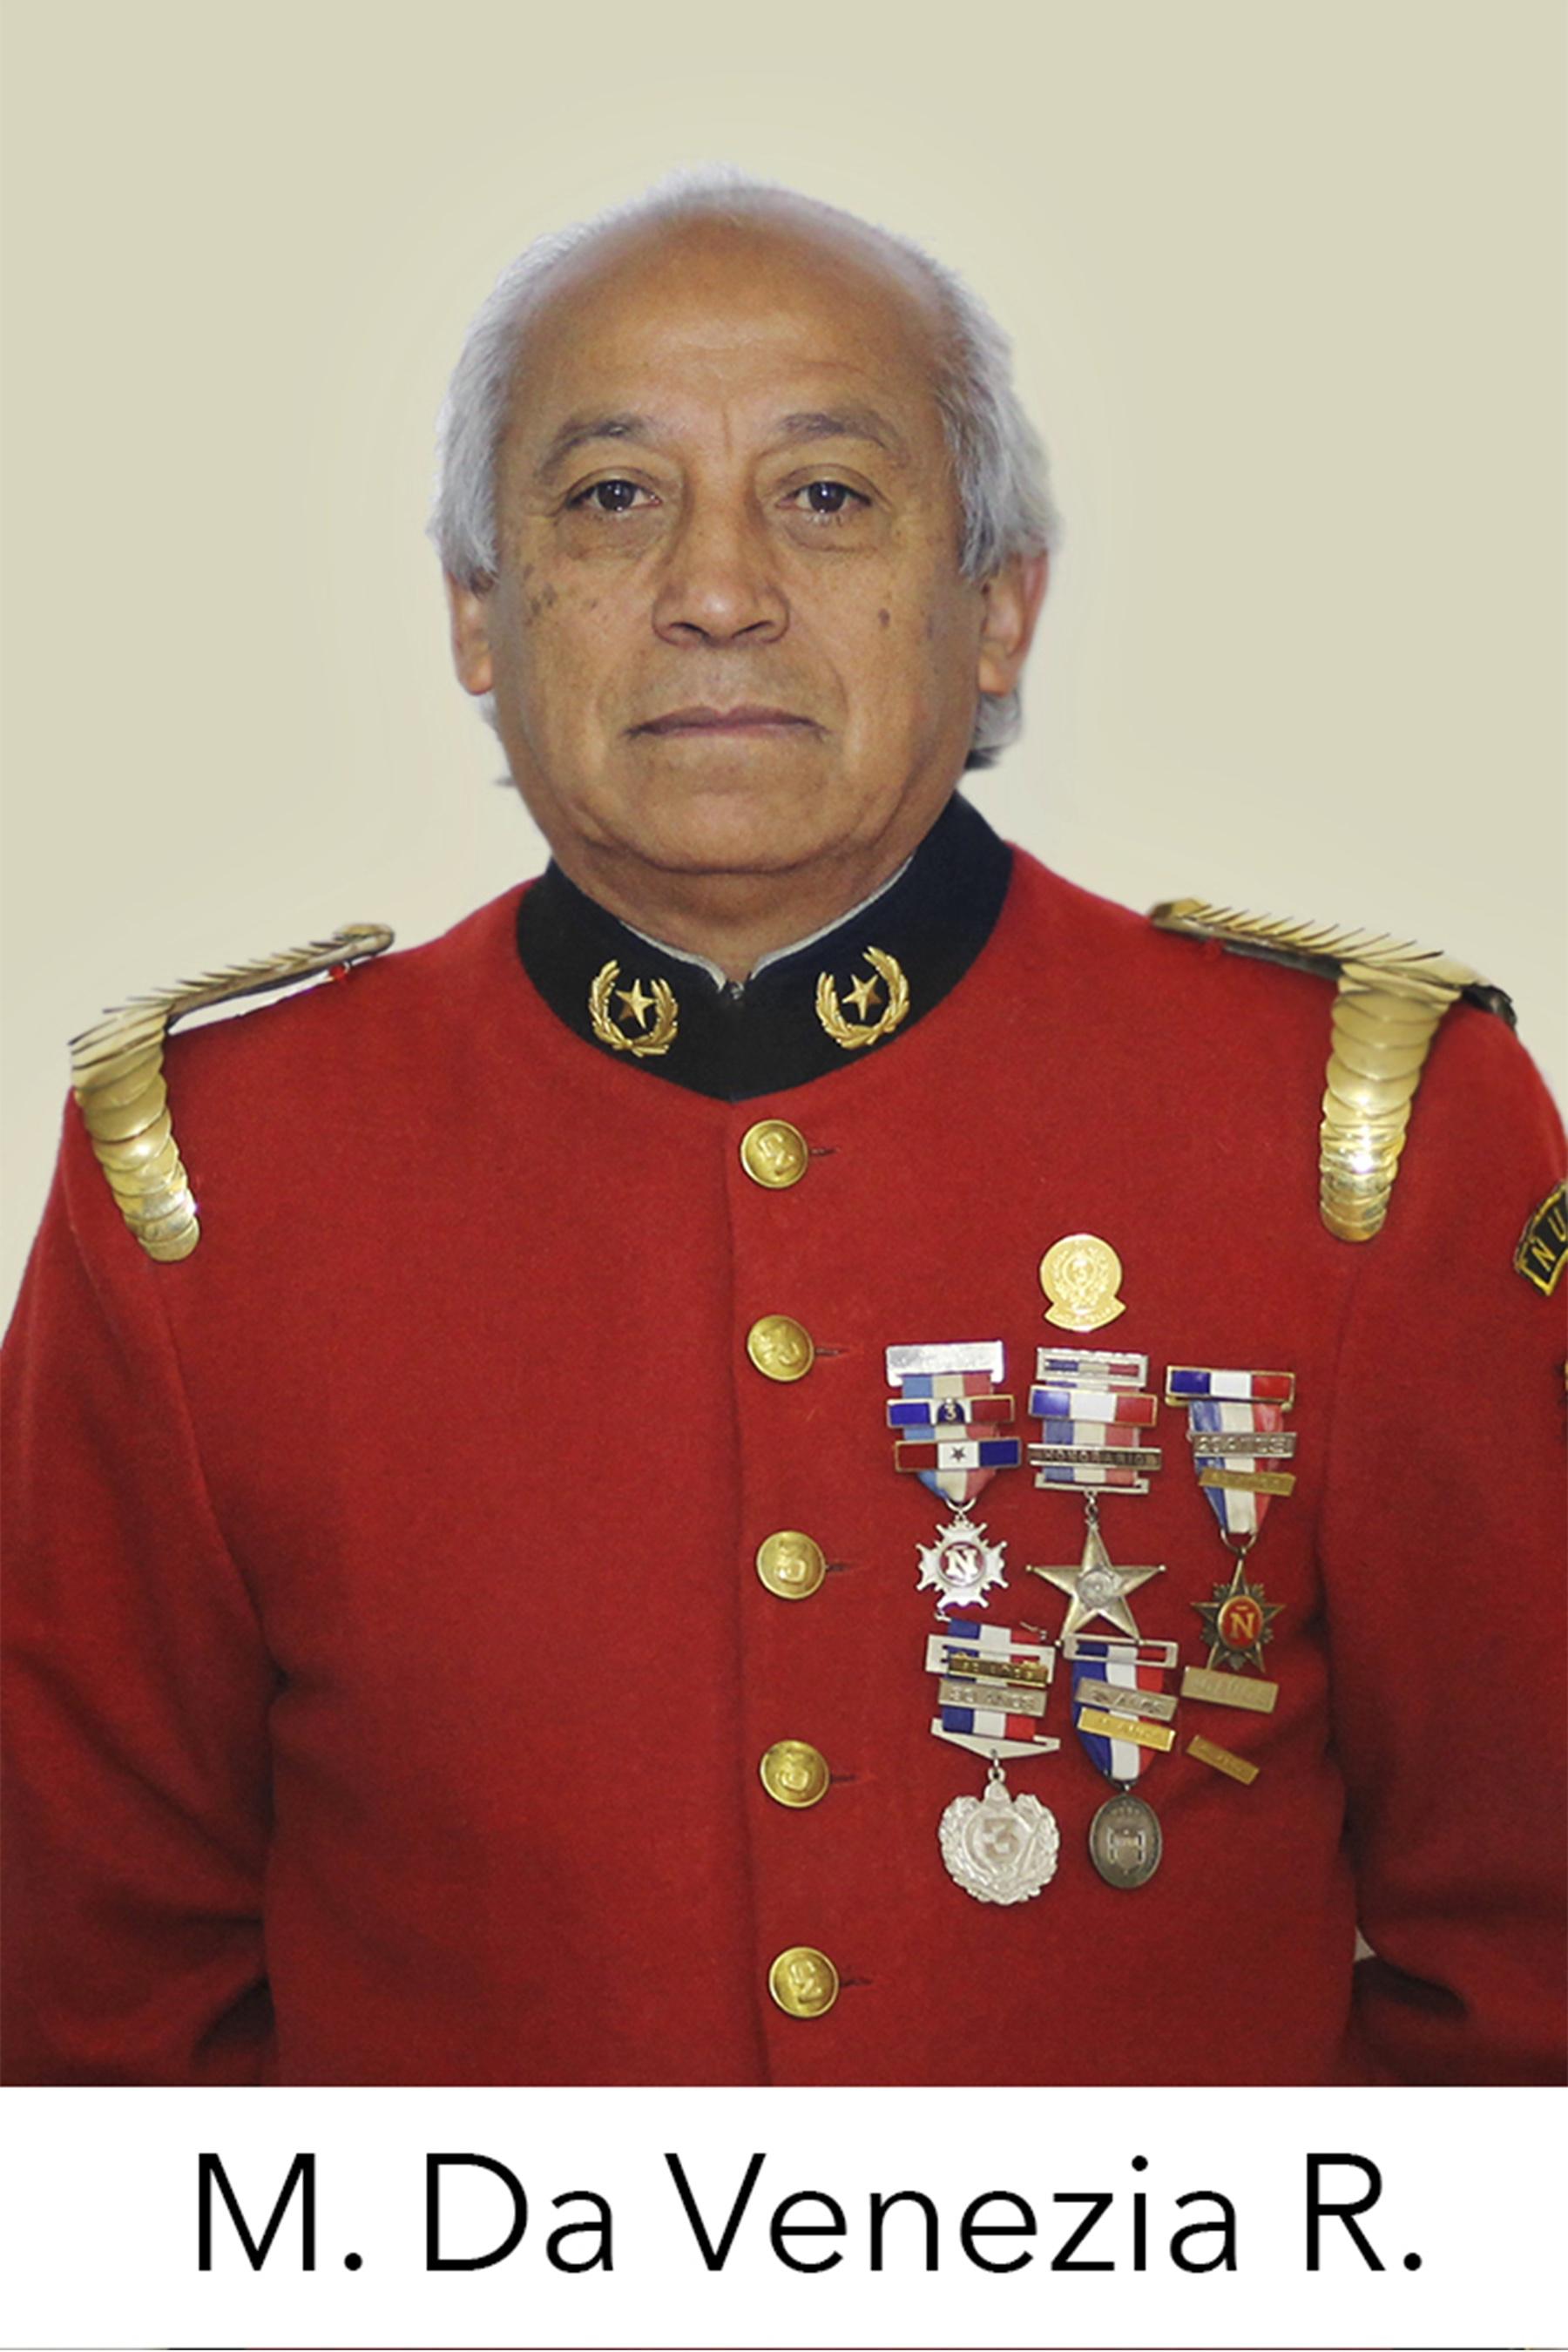 Miguel Da Venezia Retamales